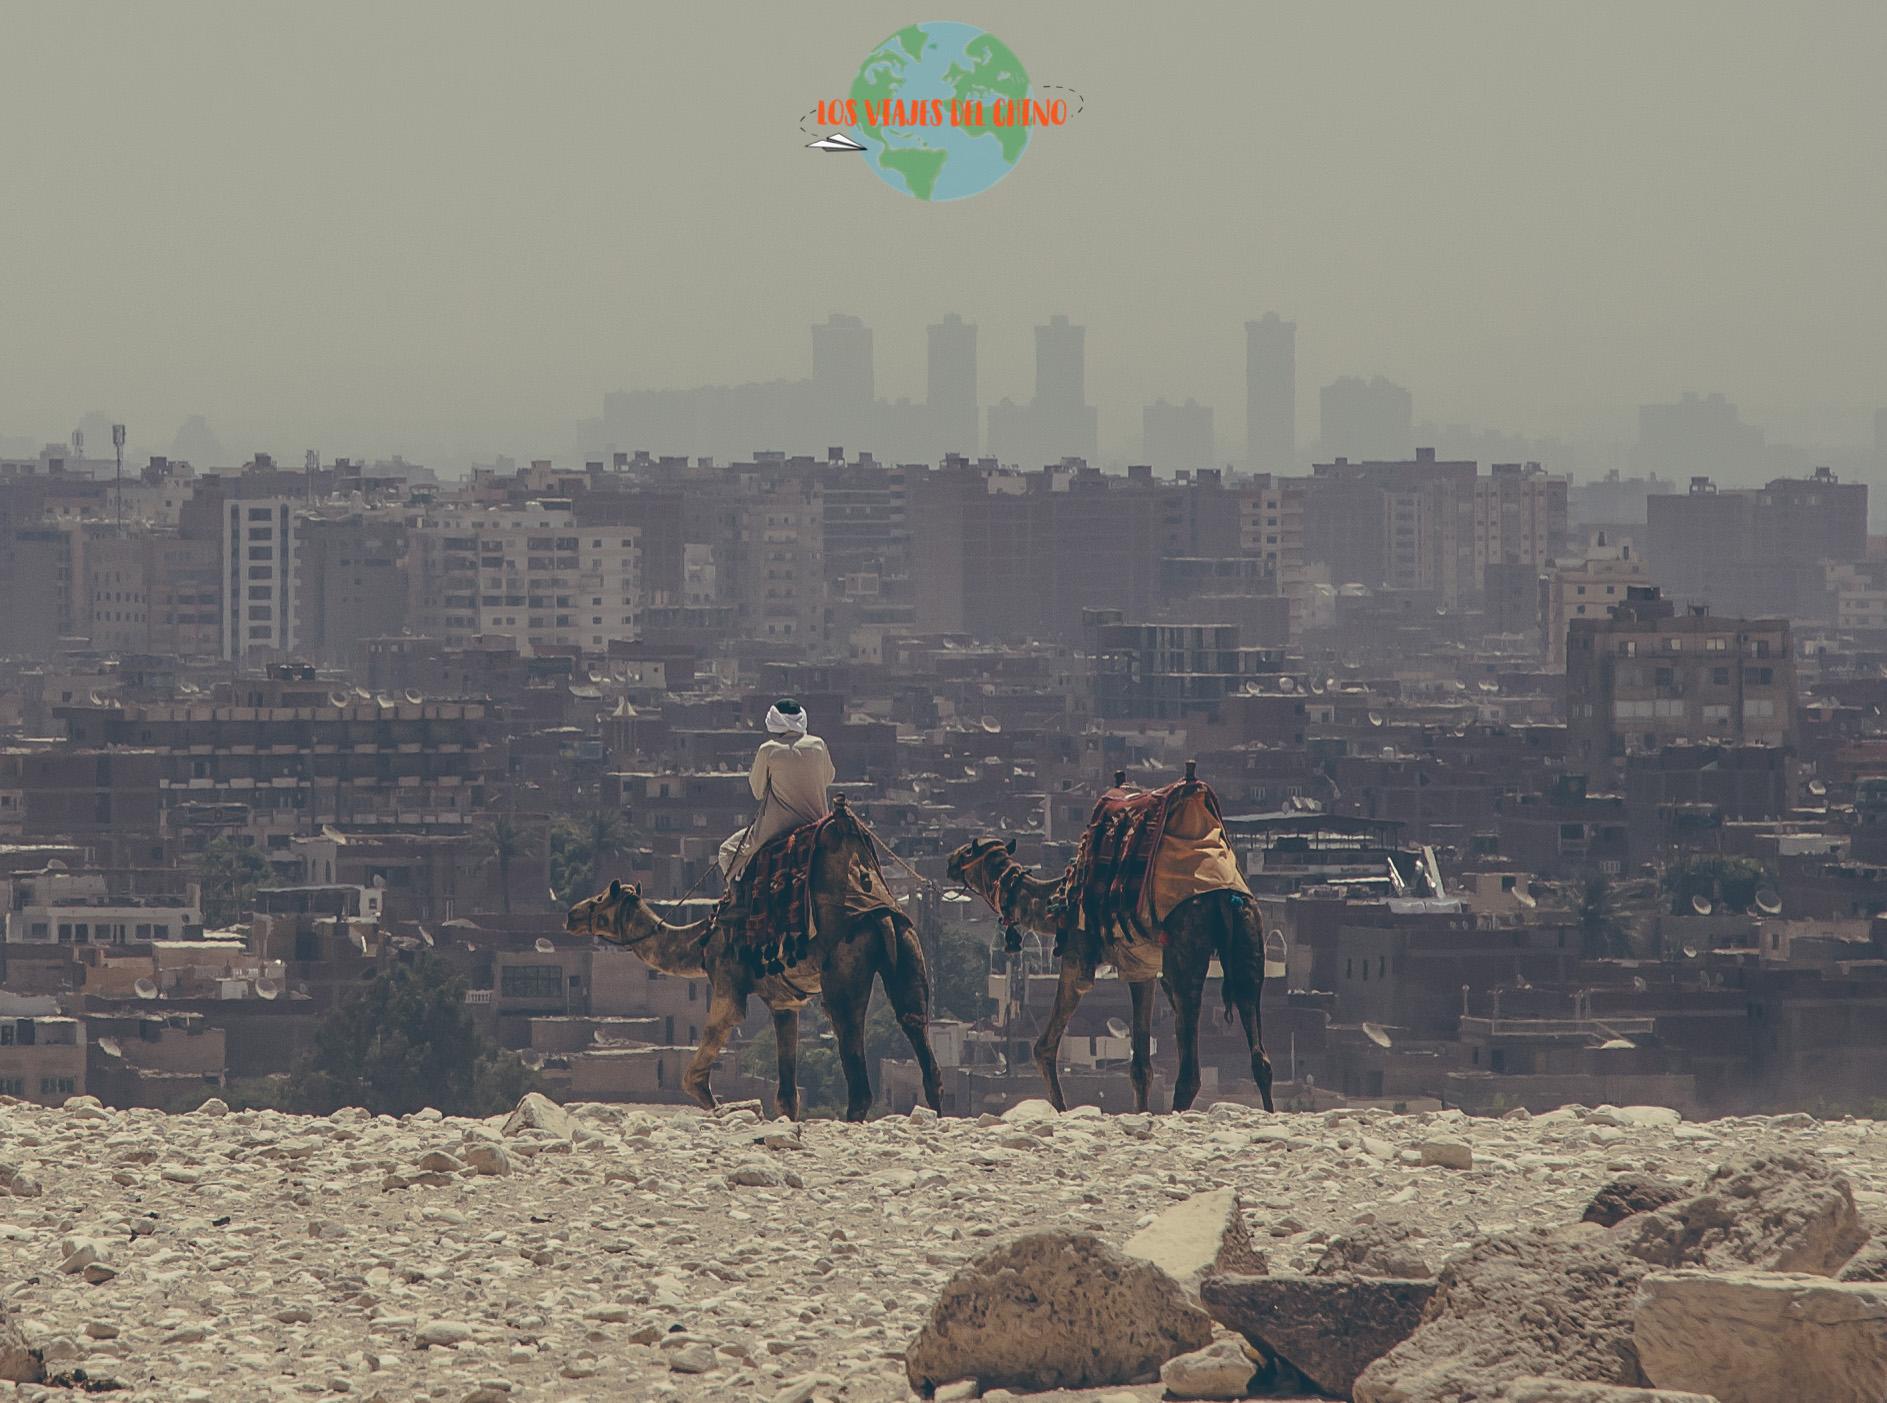 Viajar a Egipto de mochilera